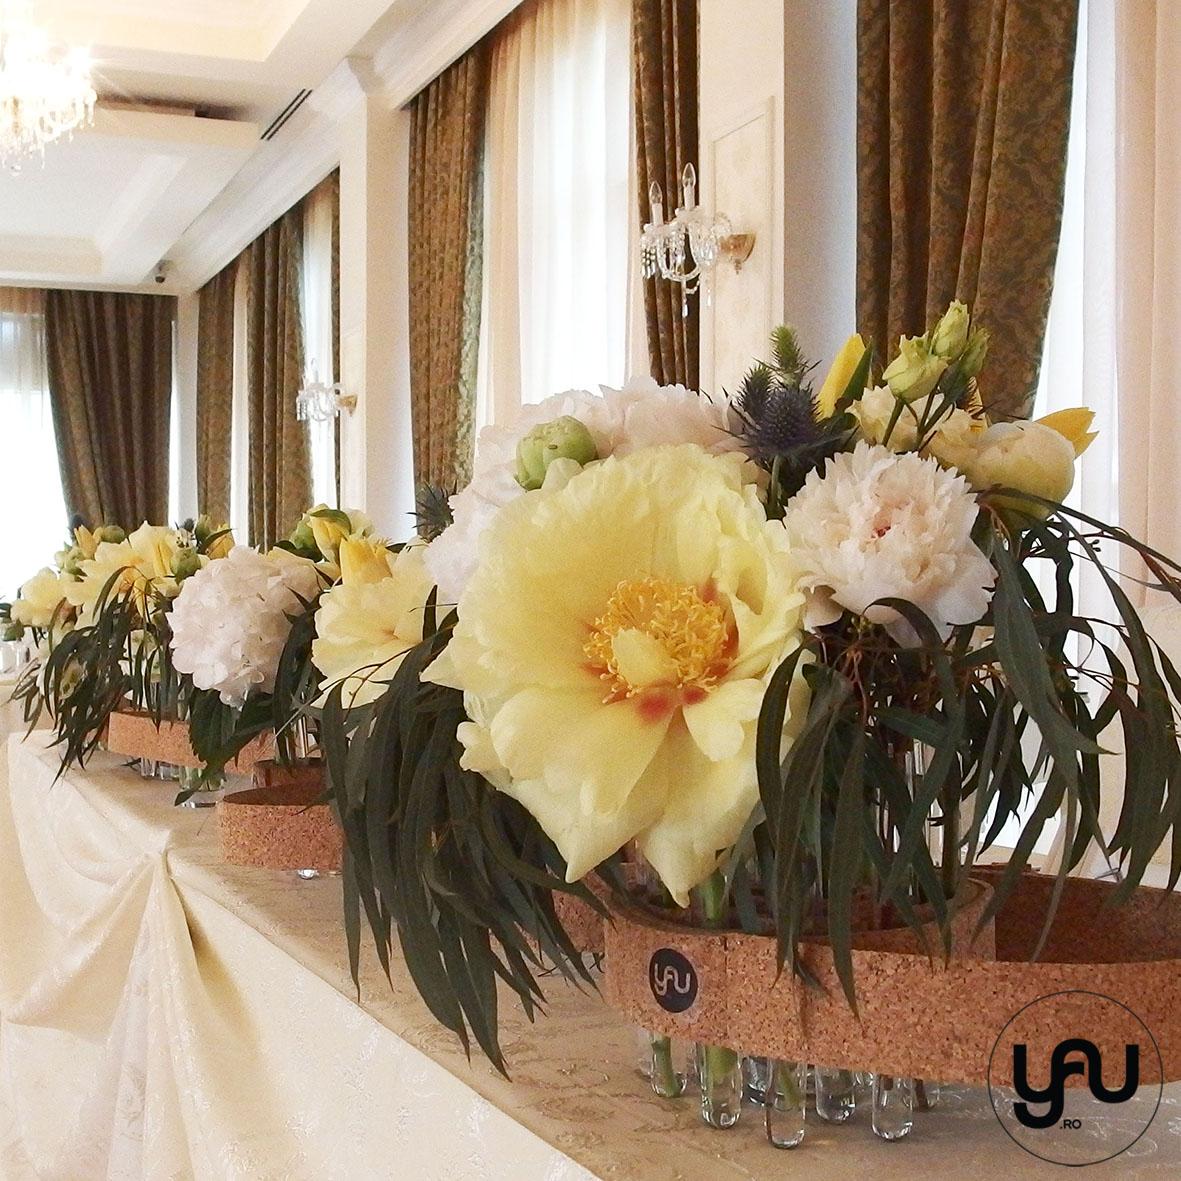 bujori-galbeni-1-_-yau-evenimente-2016-_-yau-concept-_-nunta-ambery-hall-_-elenatoader-8